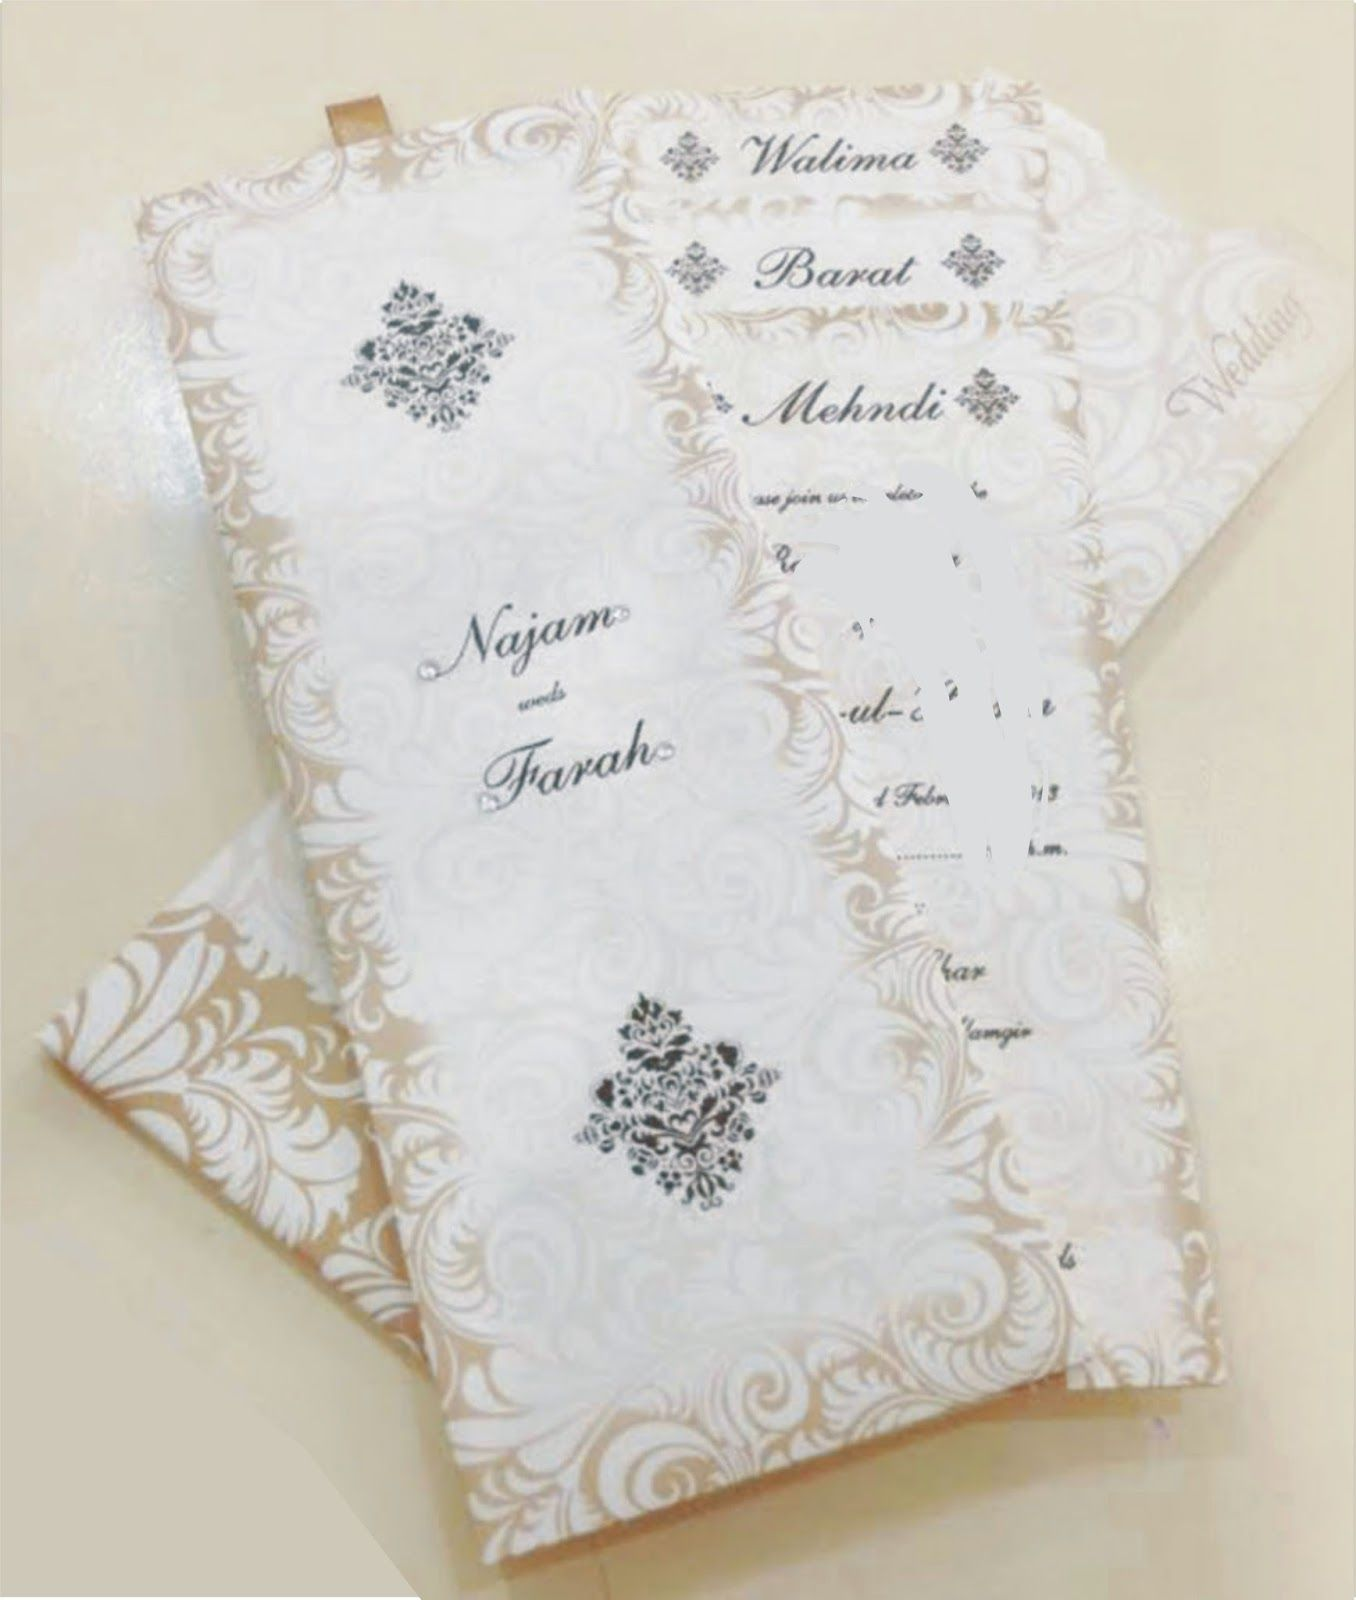 New customized wedding cards lahore pakistan wedding cards new customized wedding cards lahore pakistan wedding cards company in pakistan wedding cards company stopboris Images